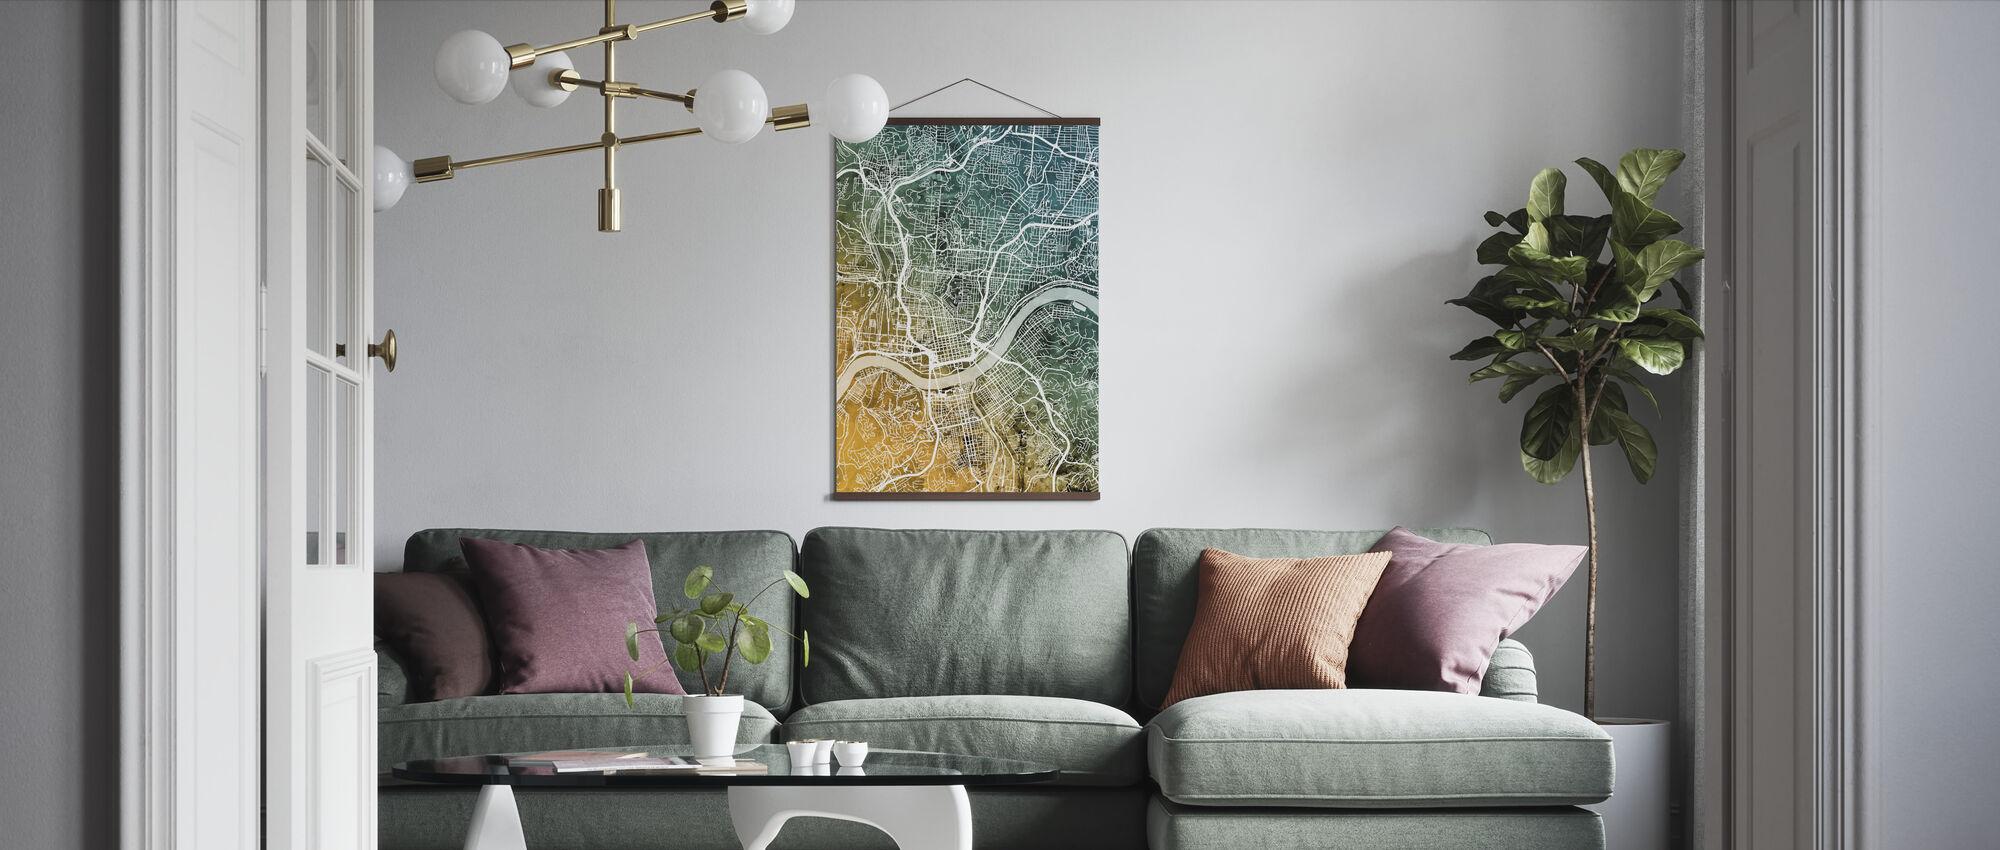 Cincinnati Ohio City Map - Poster - Living Room